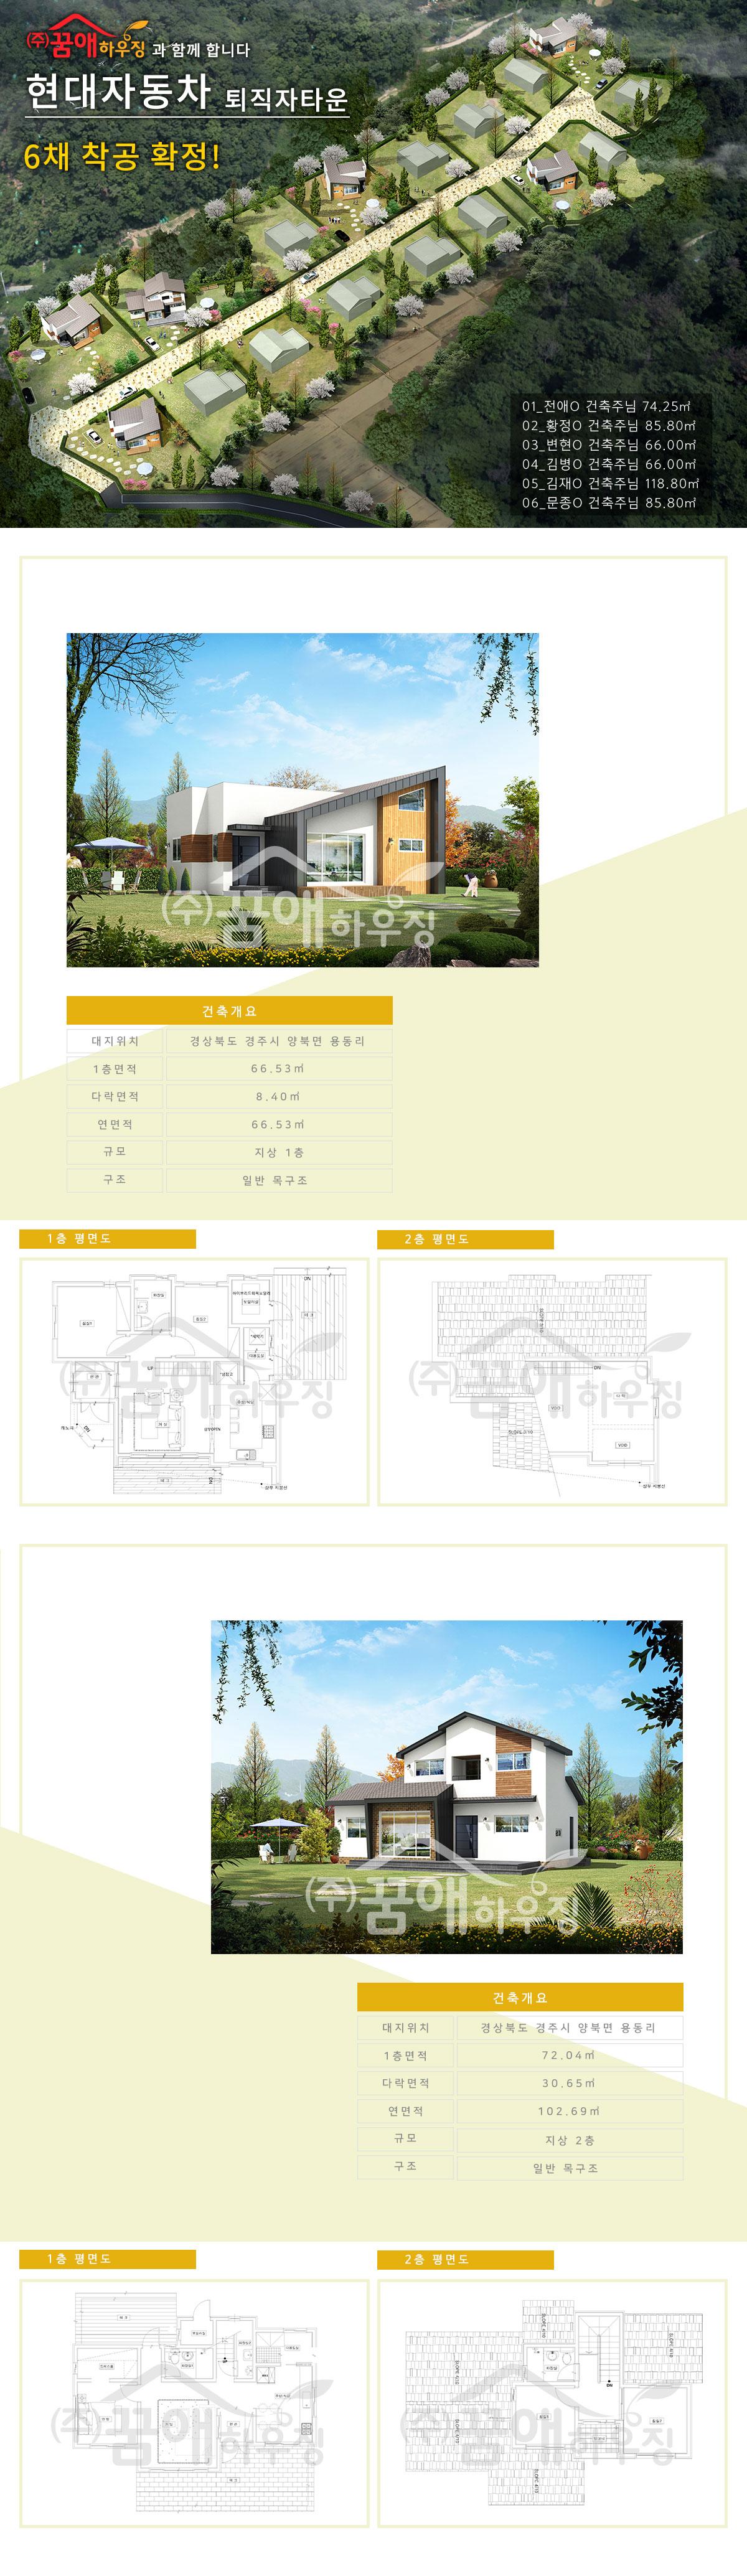 main_page.jpg